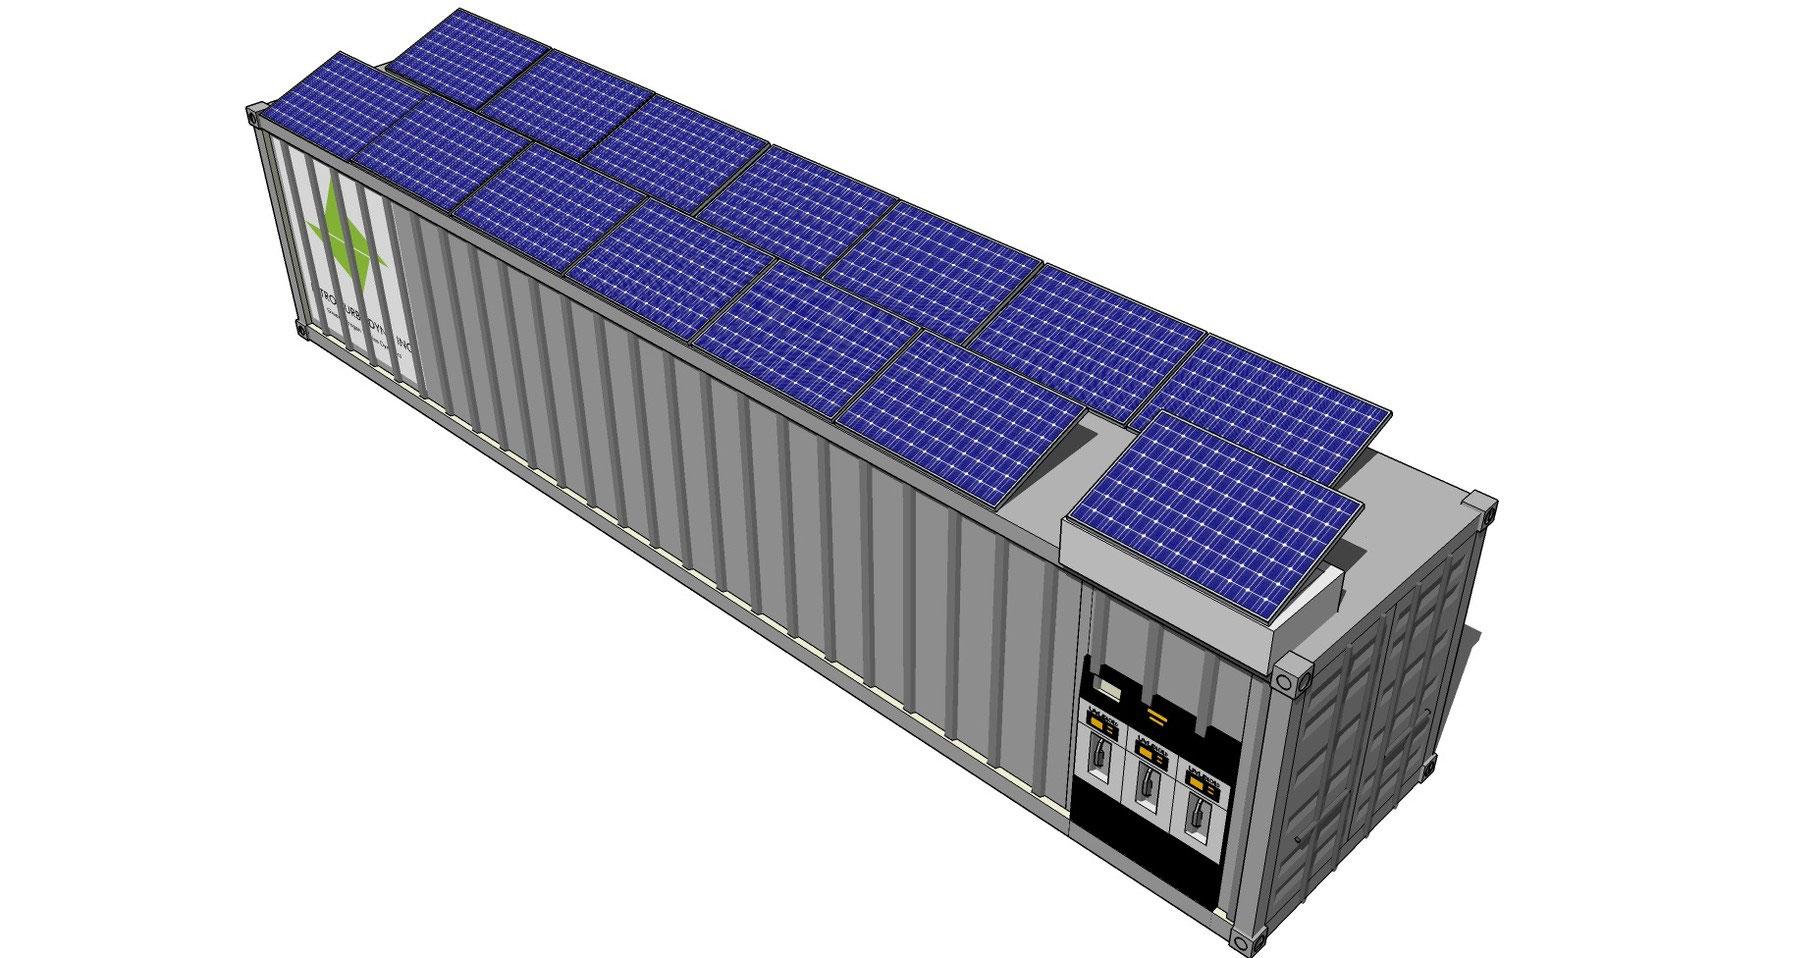 NitroTurbodyne - Clean, Green Energy